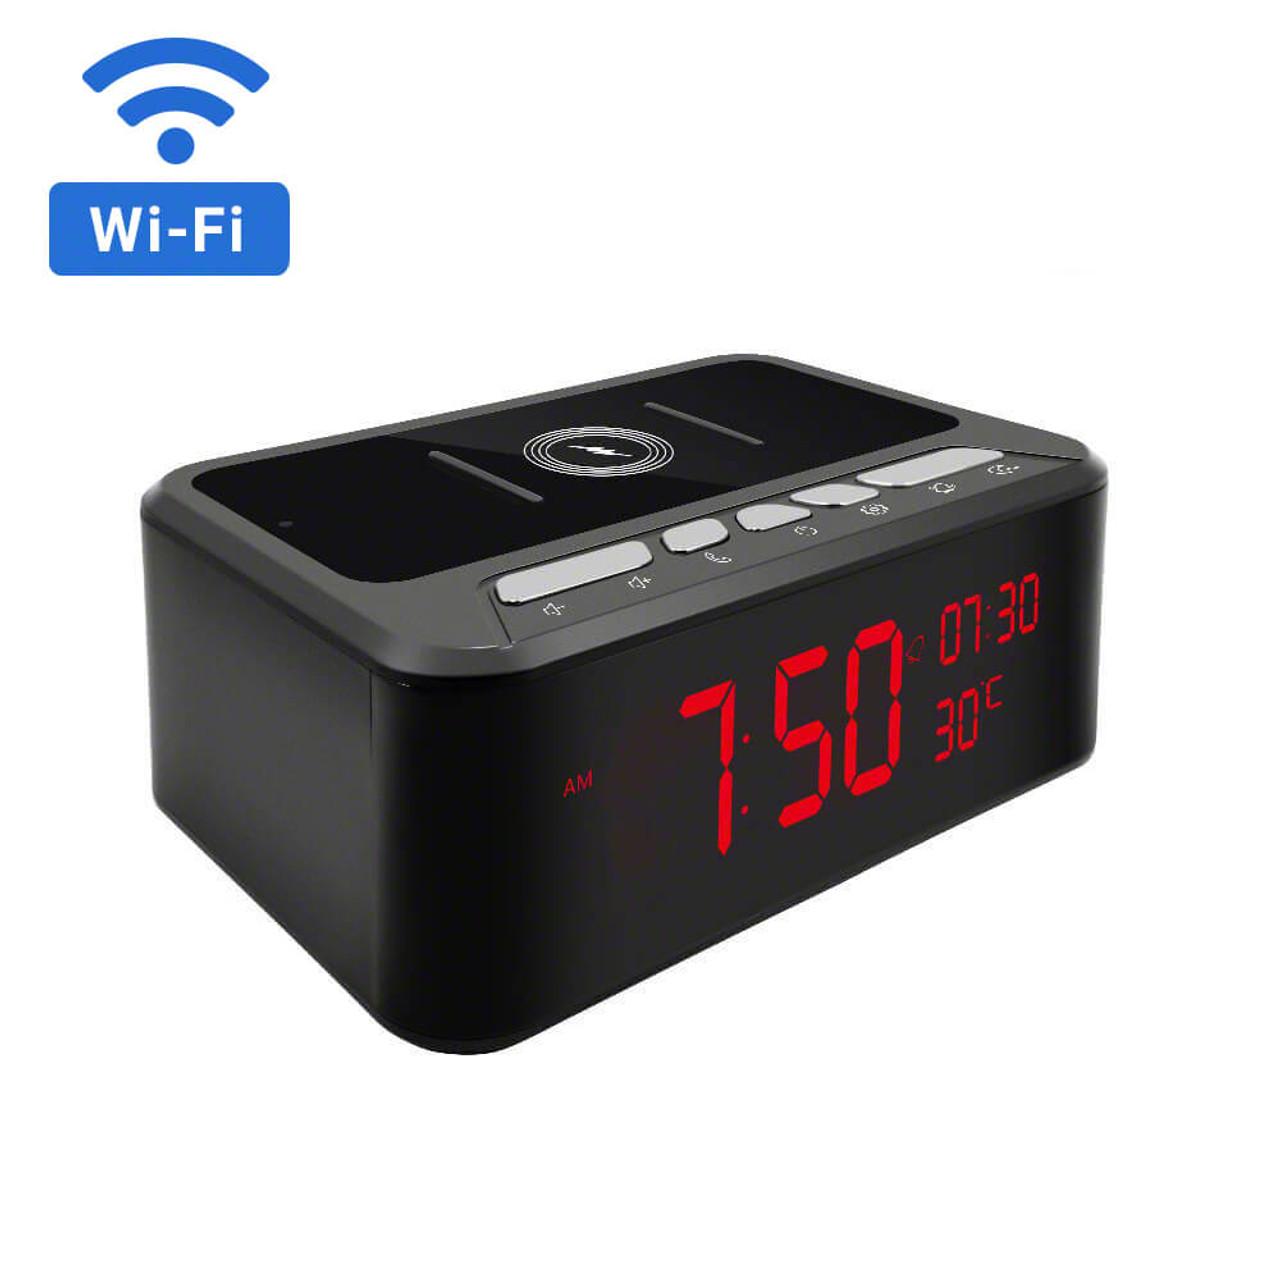 1080P HD WiFi Multifunction Clock Hidden Camera with Night Vision